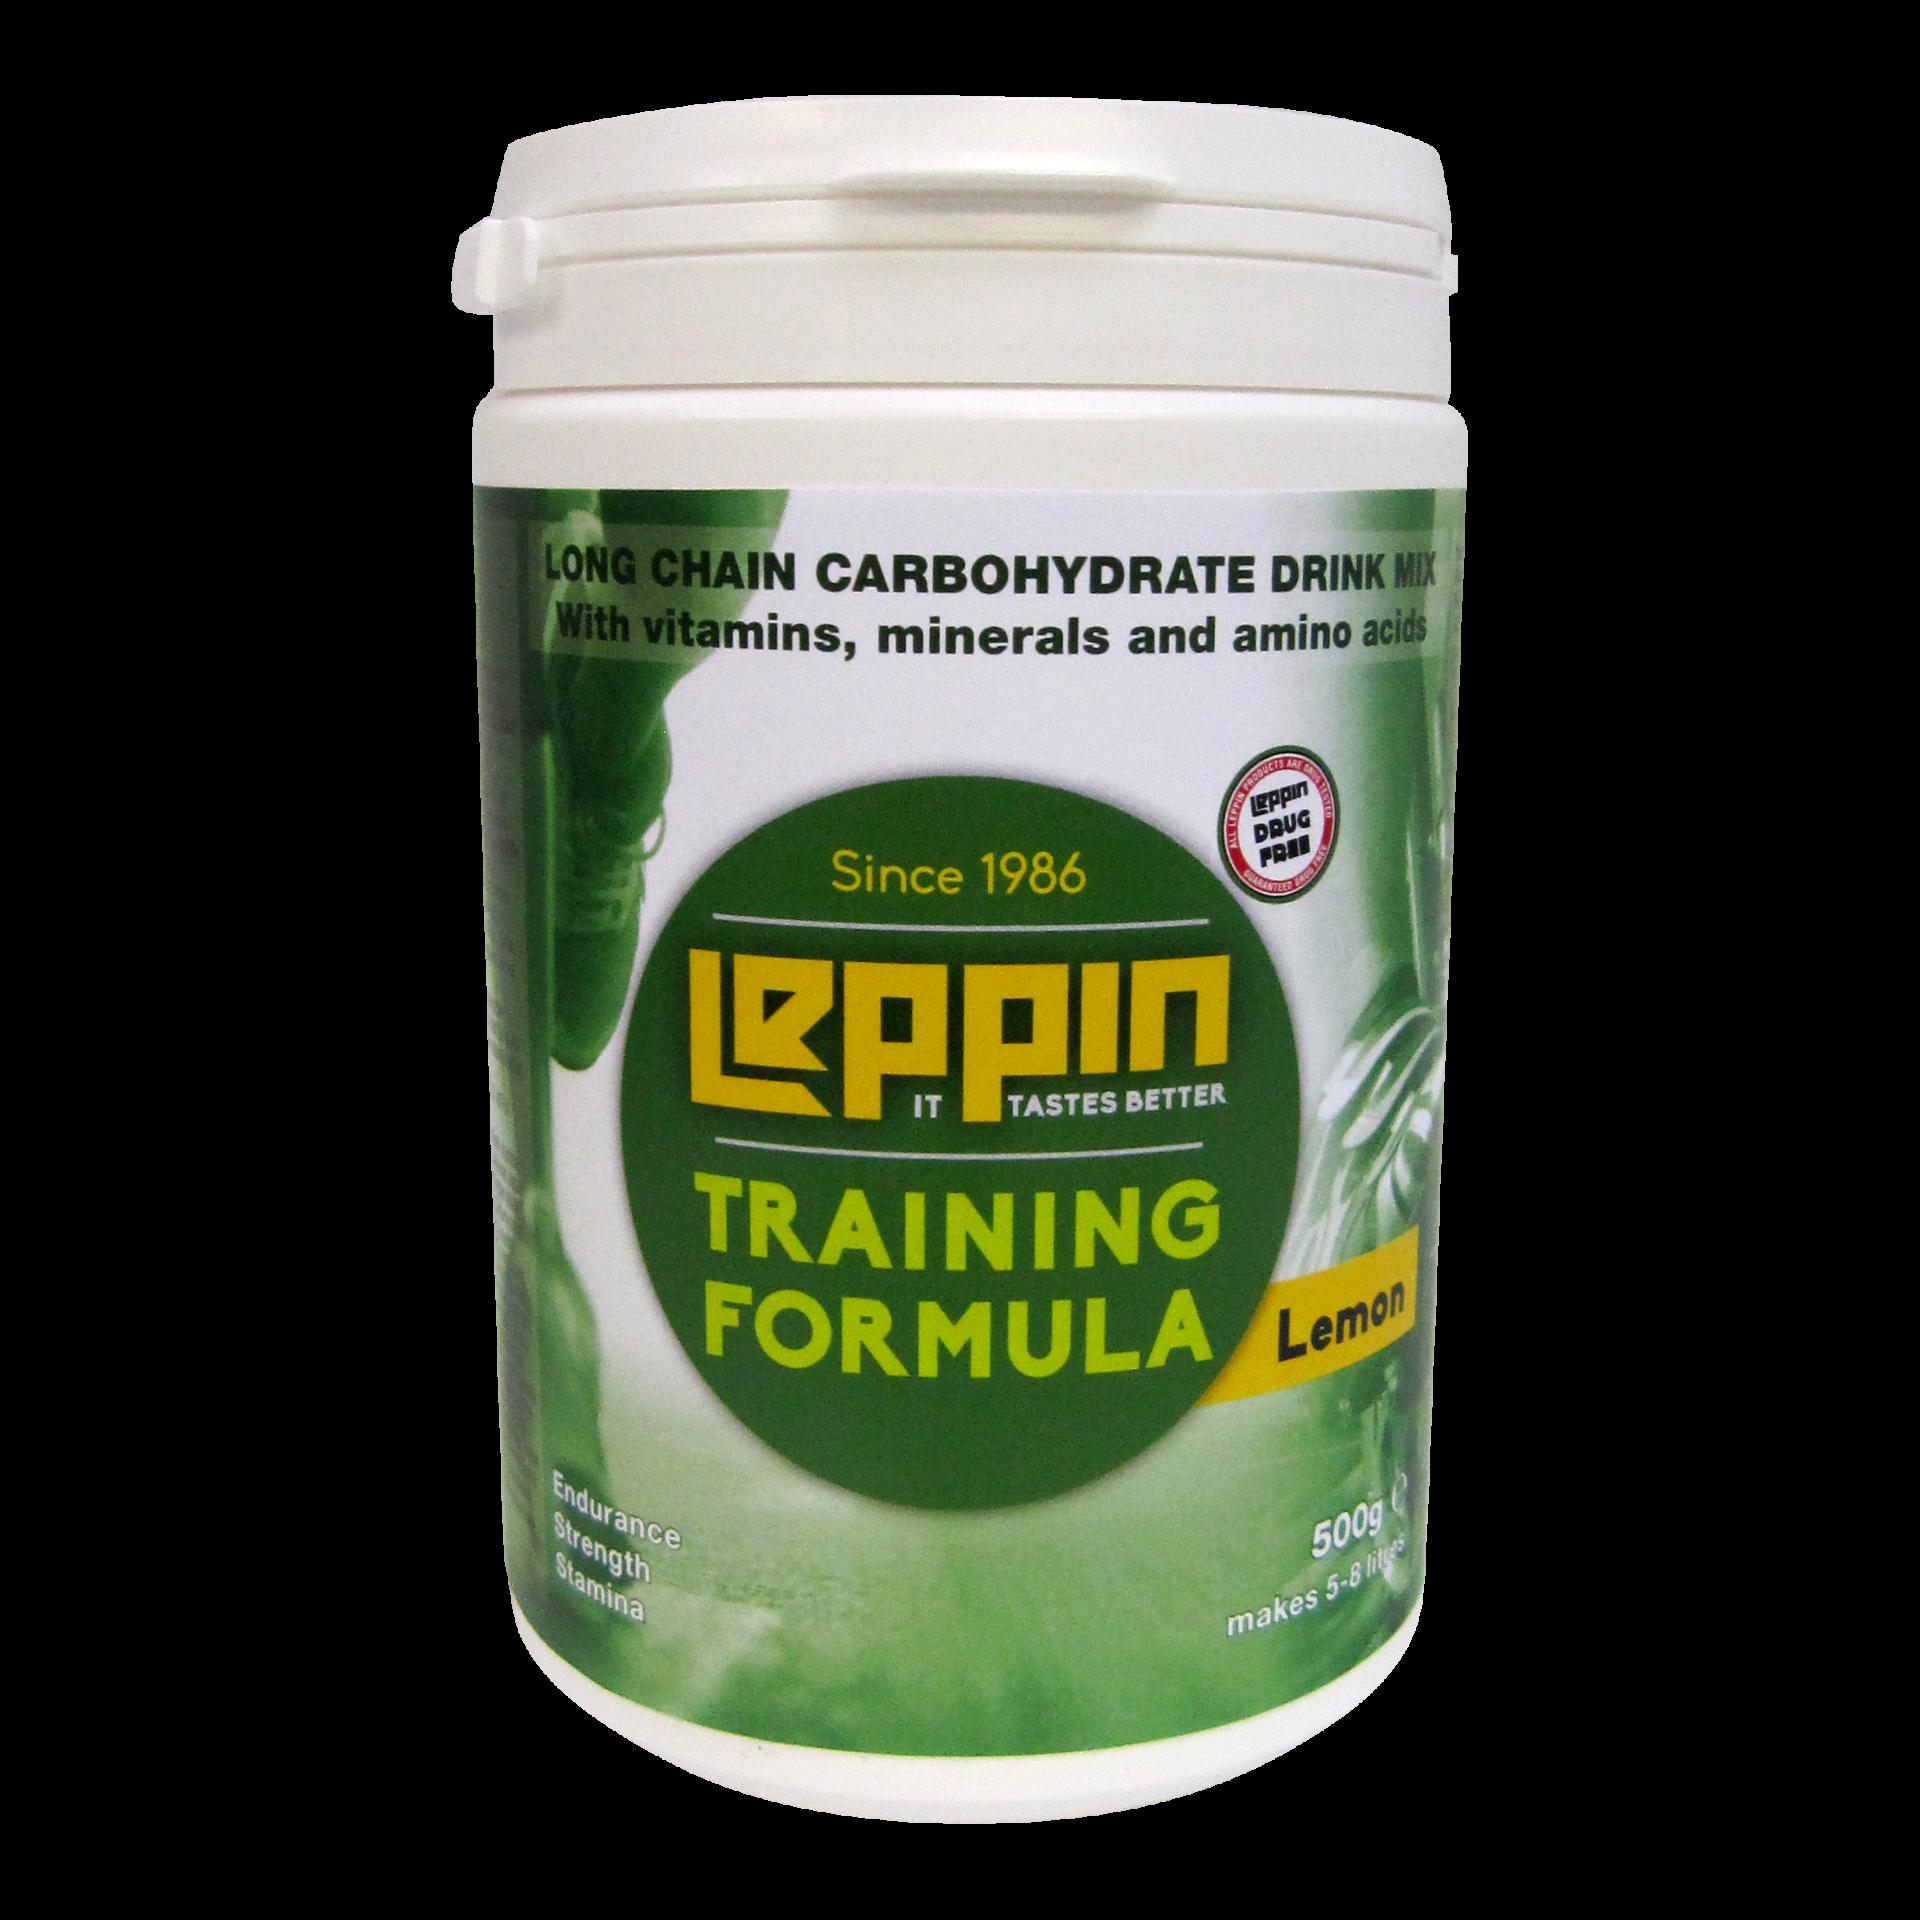 Leppin Training Formula